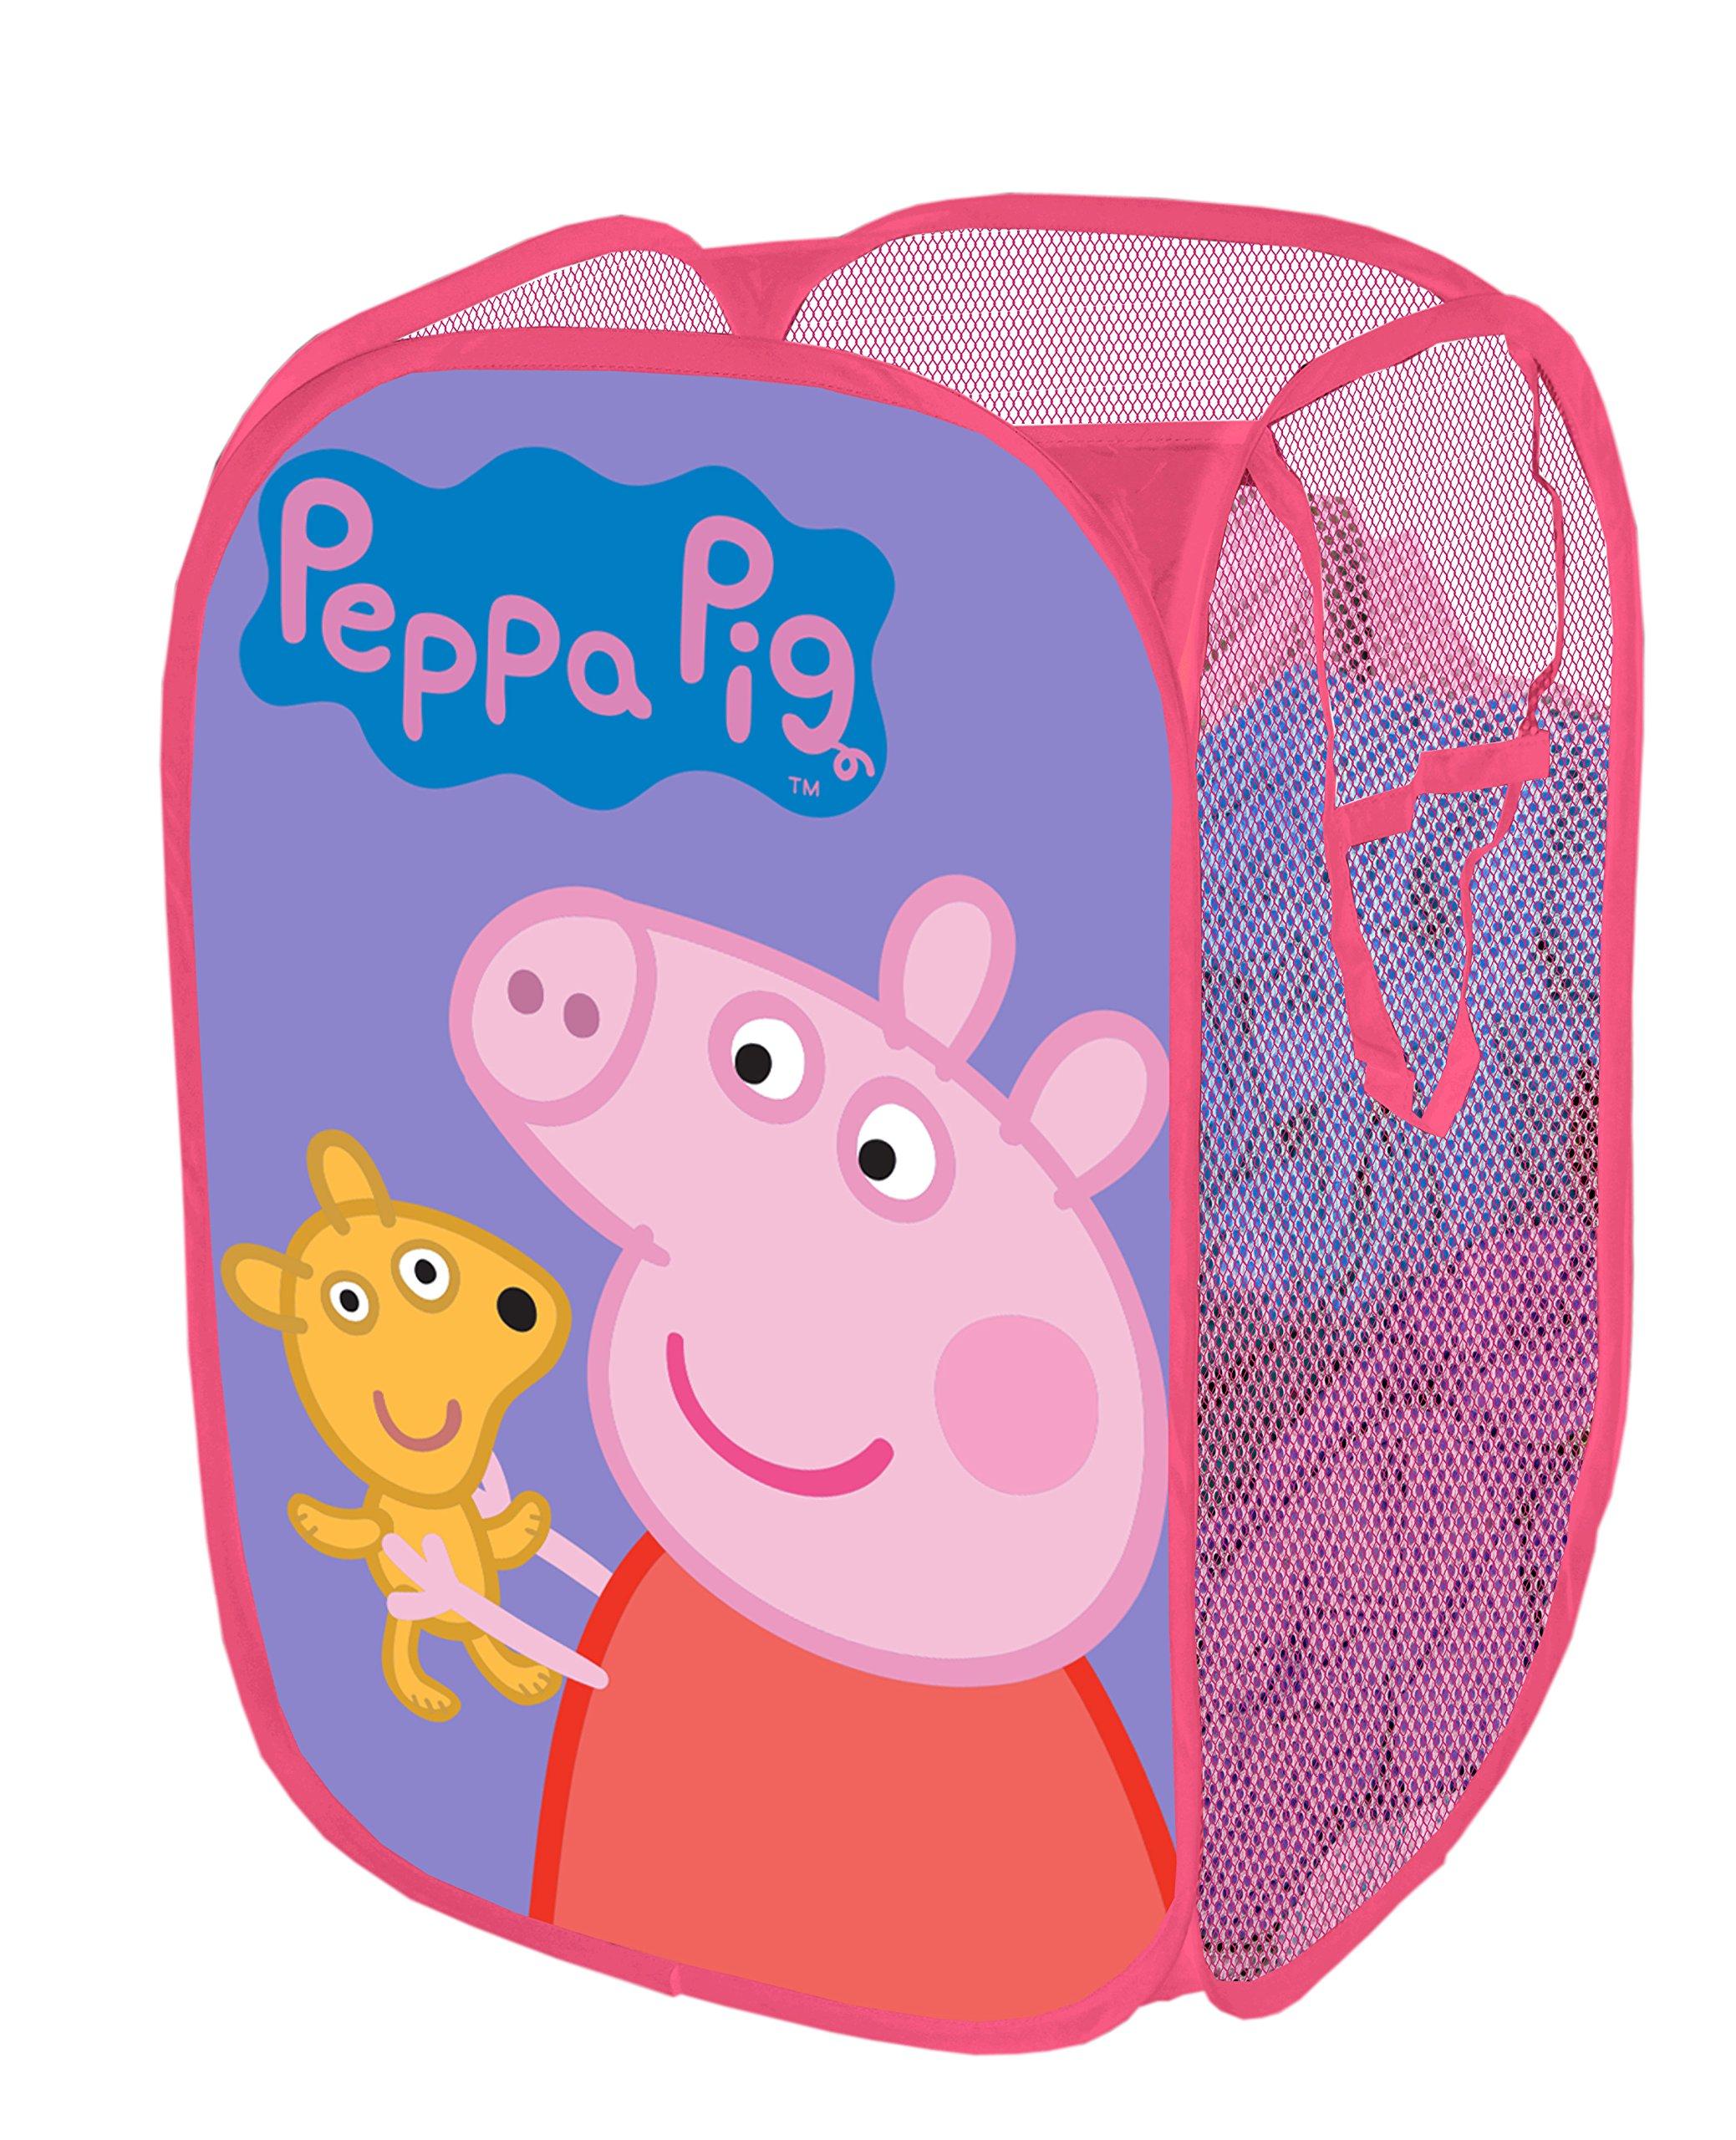 Peppa Pig Pop Up Hamper, 13.5 x 13.5 x 21.5